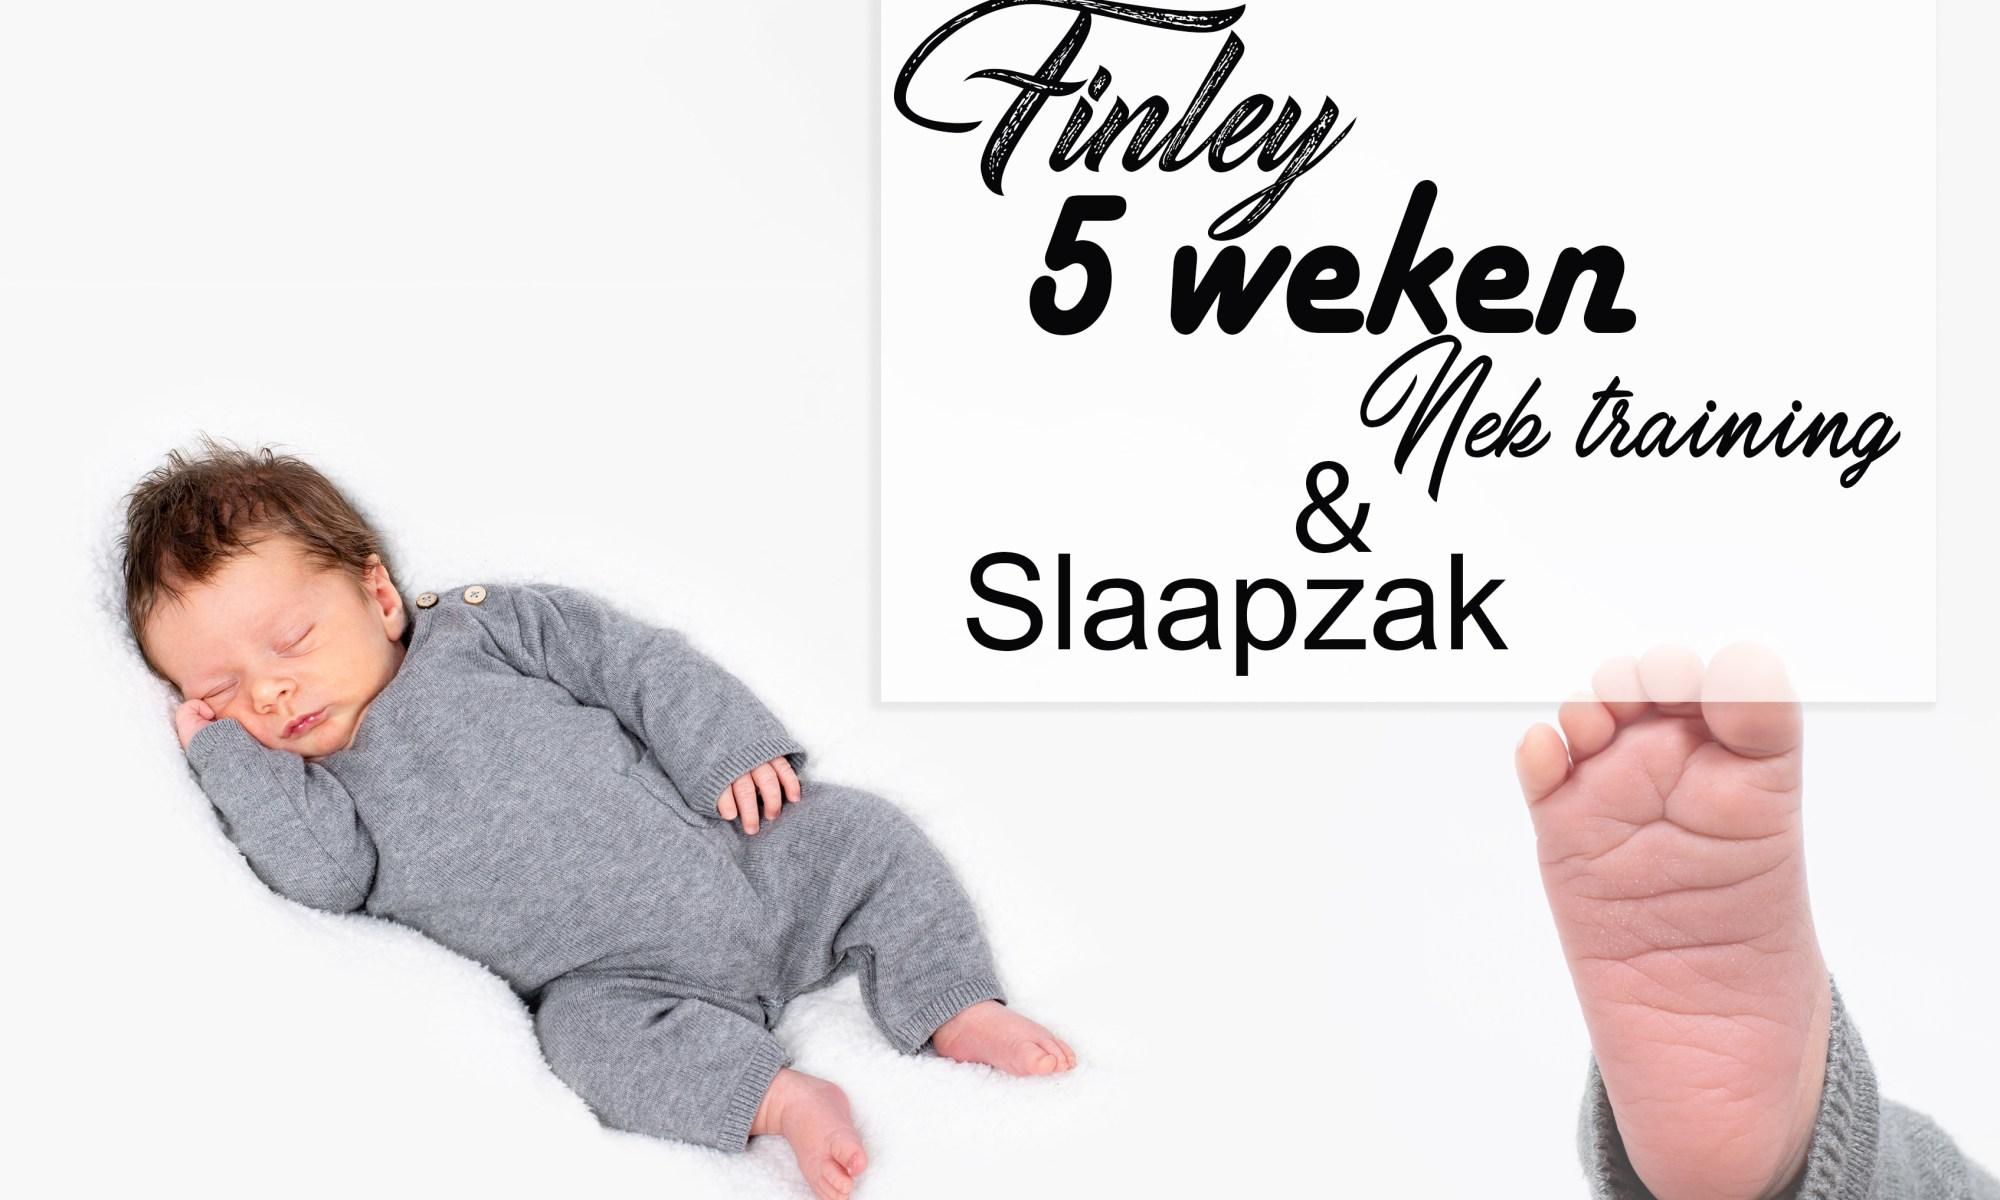 Finley 5 weken oud baby newborn borstvoeding mama pasgeboren mama blog foto shoot www.liefkleiwonder.nl baby shoot ontwikkeling slaapzak